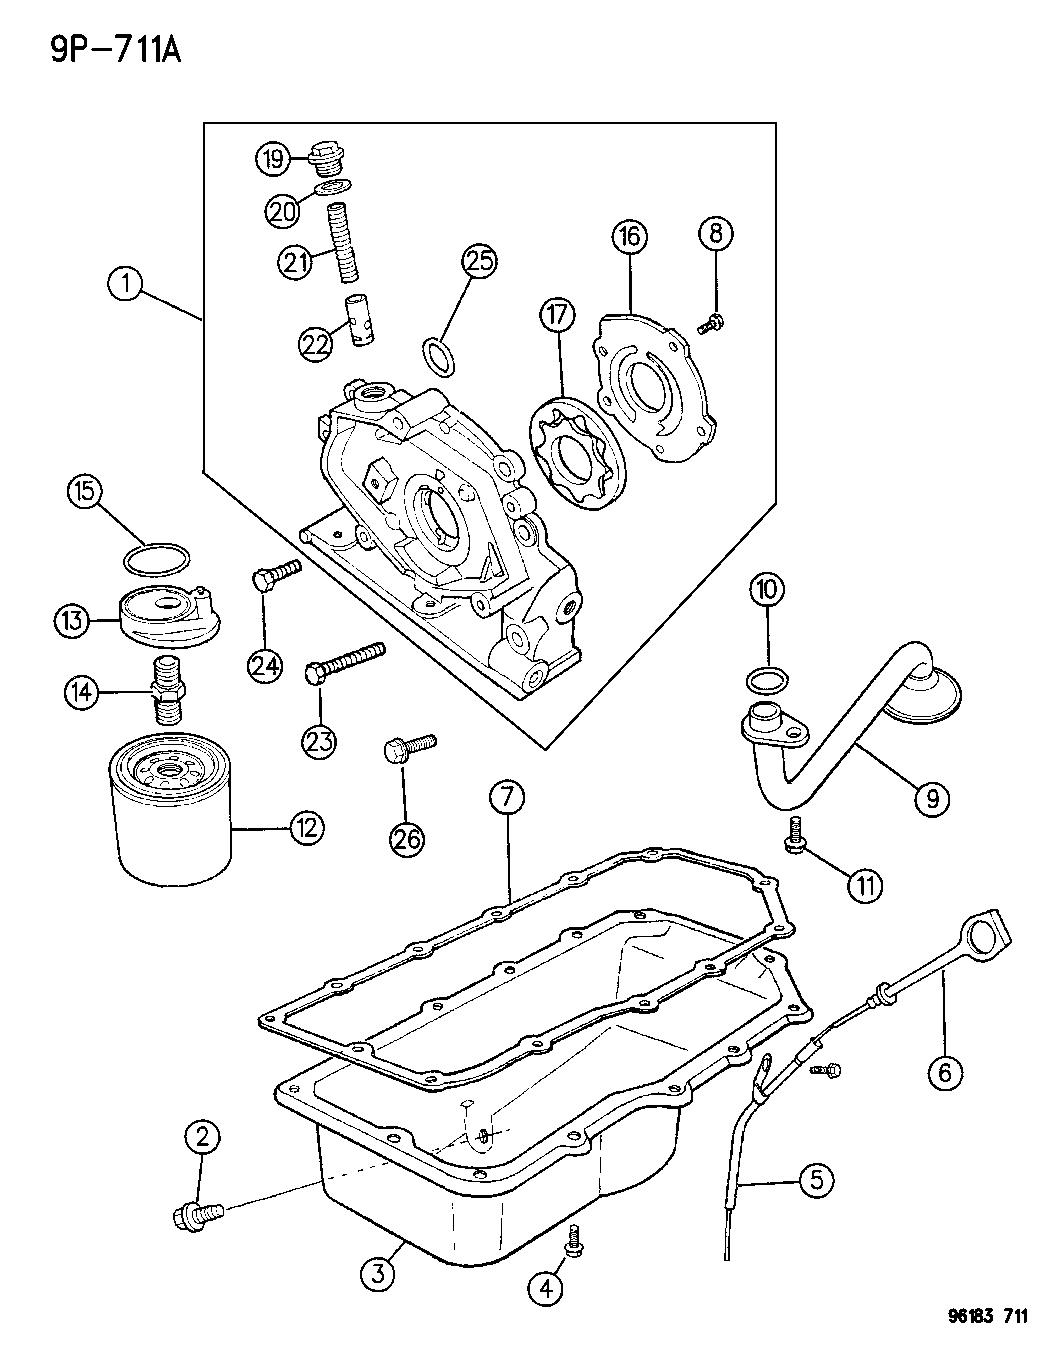 1996 Chrysler Cirrus Engine Oiling